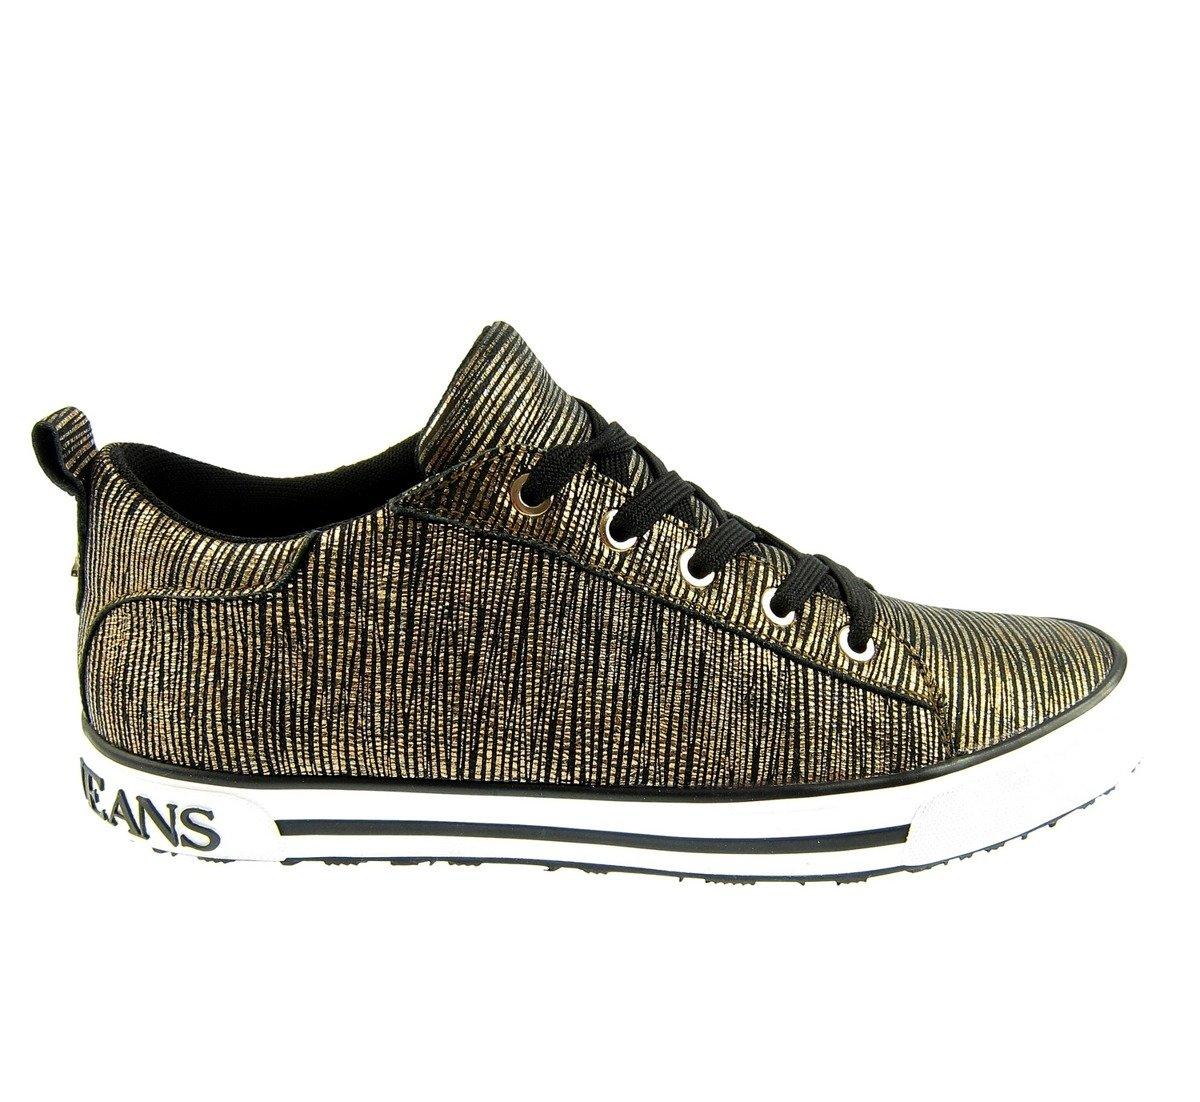 buy online 42644 281a5 ARMANI JEANS 925907 Damen Women Sneaker Schuhe Shoes Gold Rust Brown